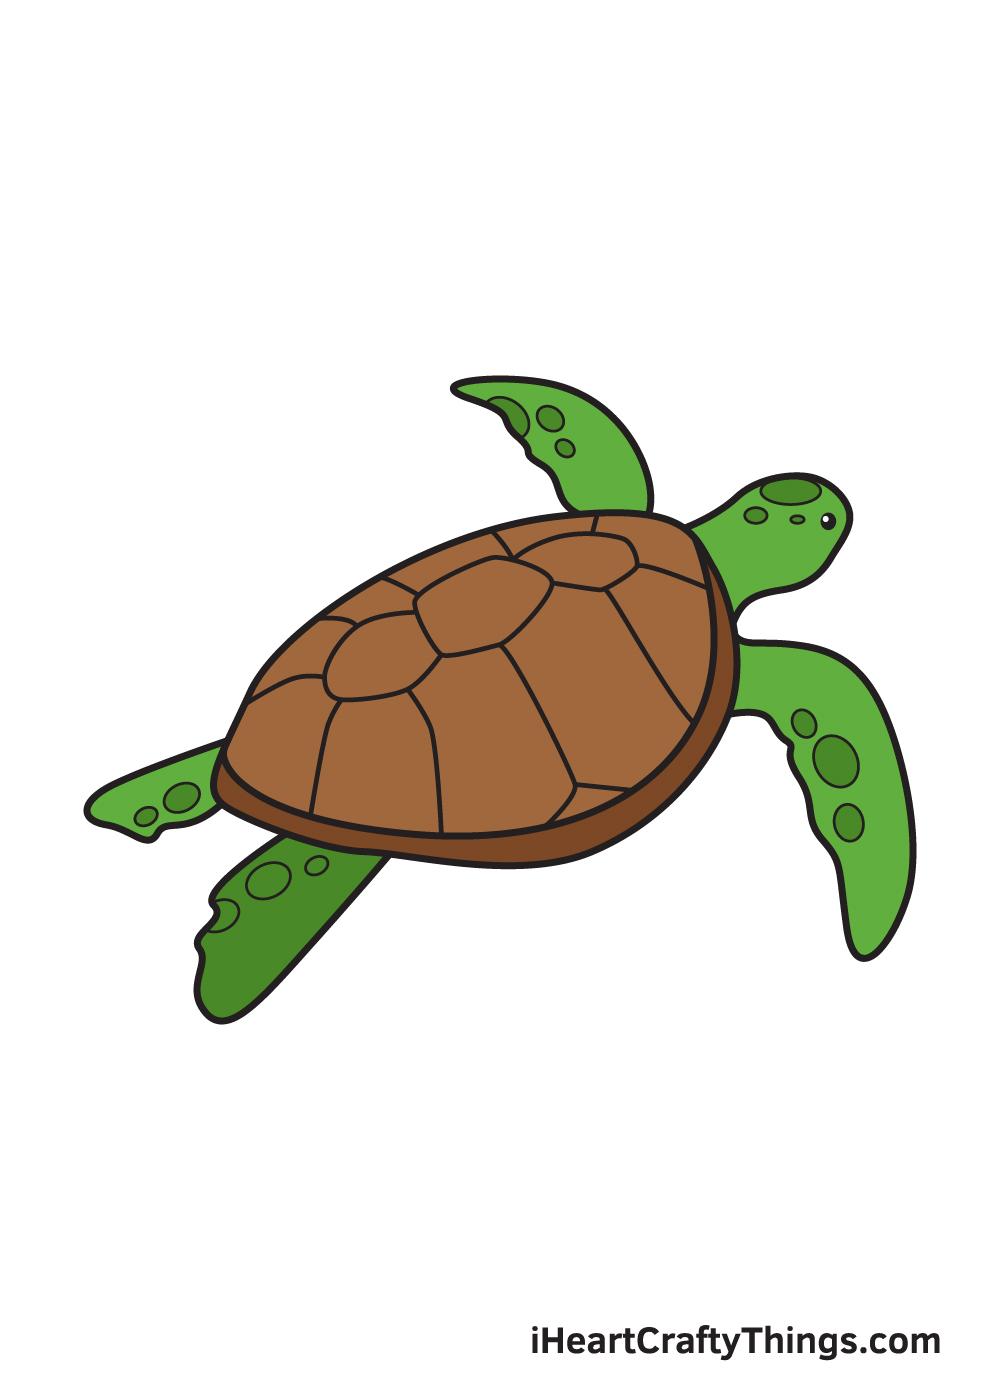 Sea Turtle Drawing – 9 Steps